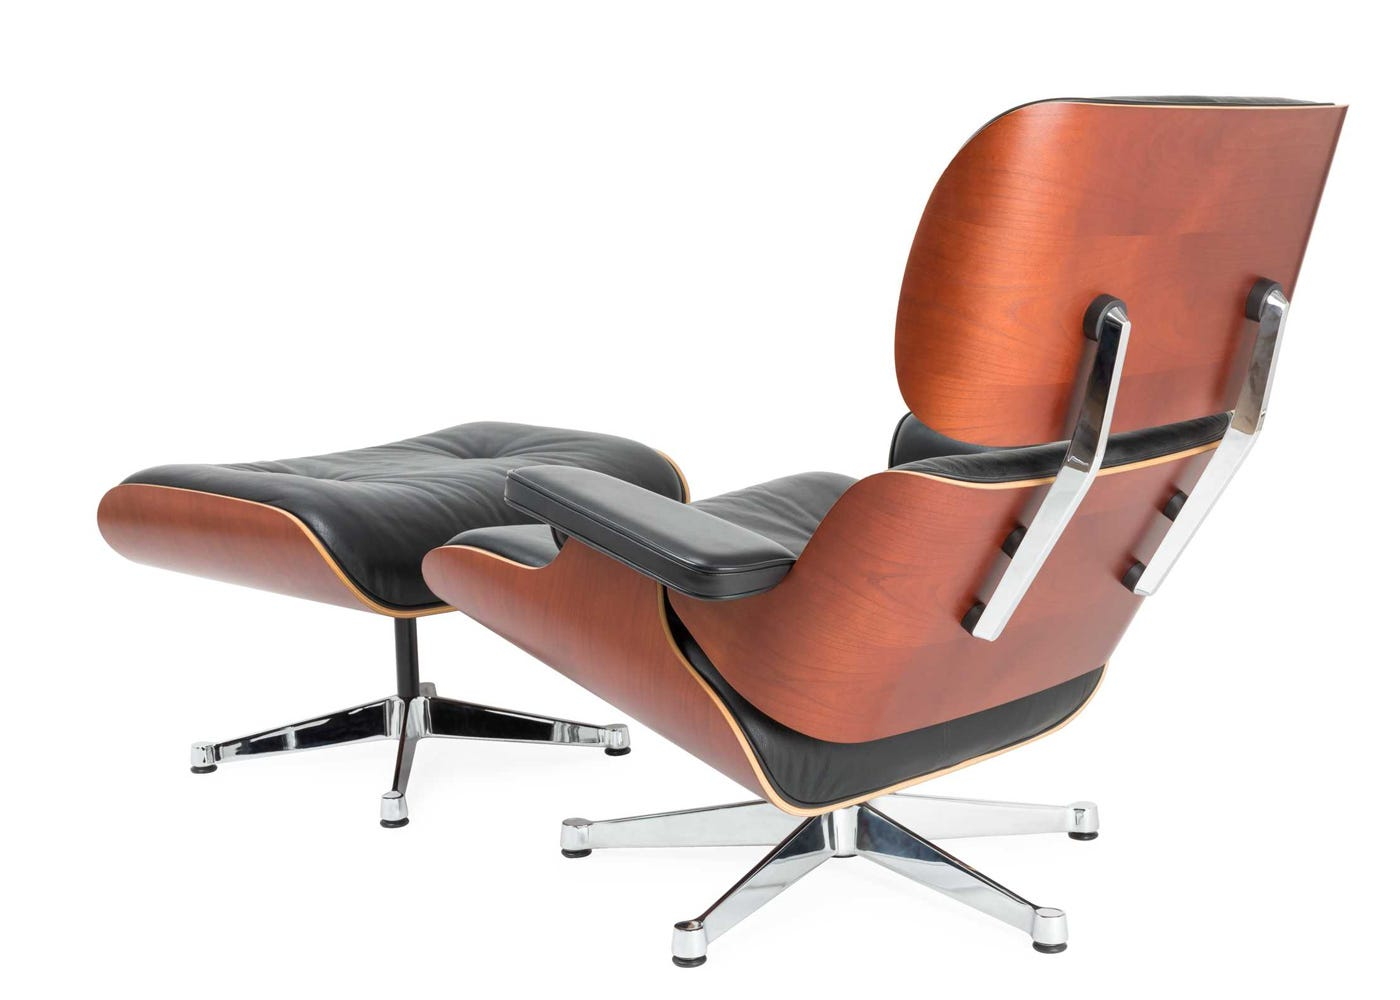 Longe Chair vitra eames lounge chair & ottoman (classic) black